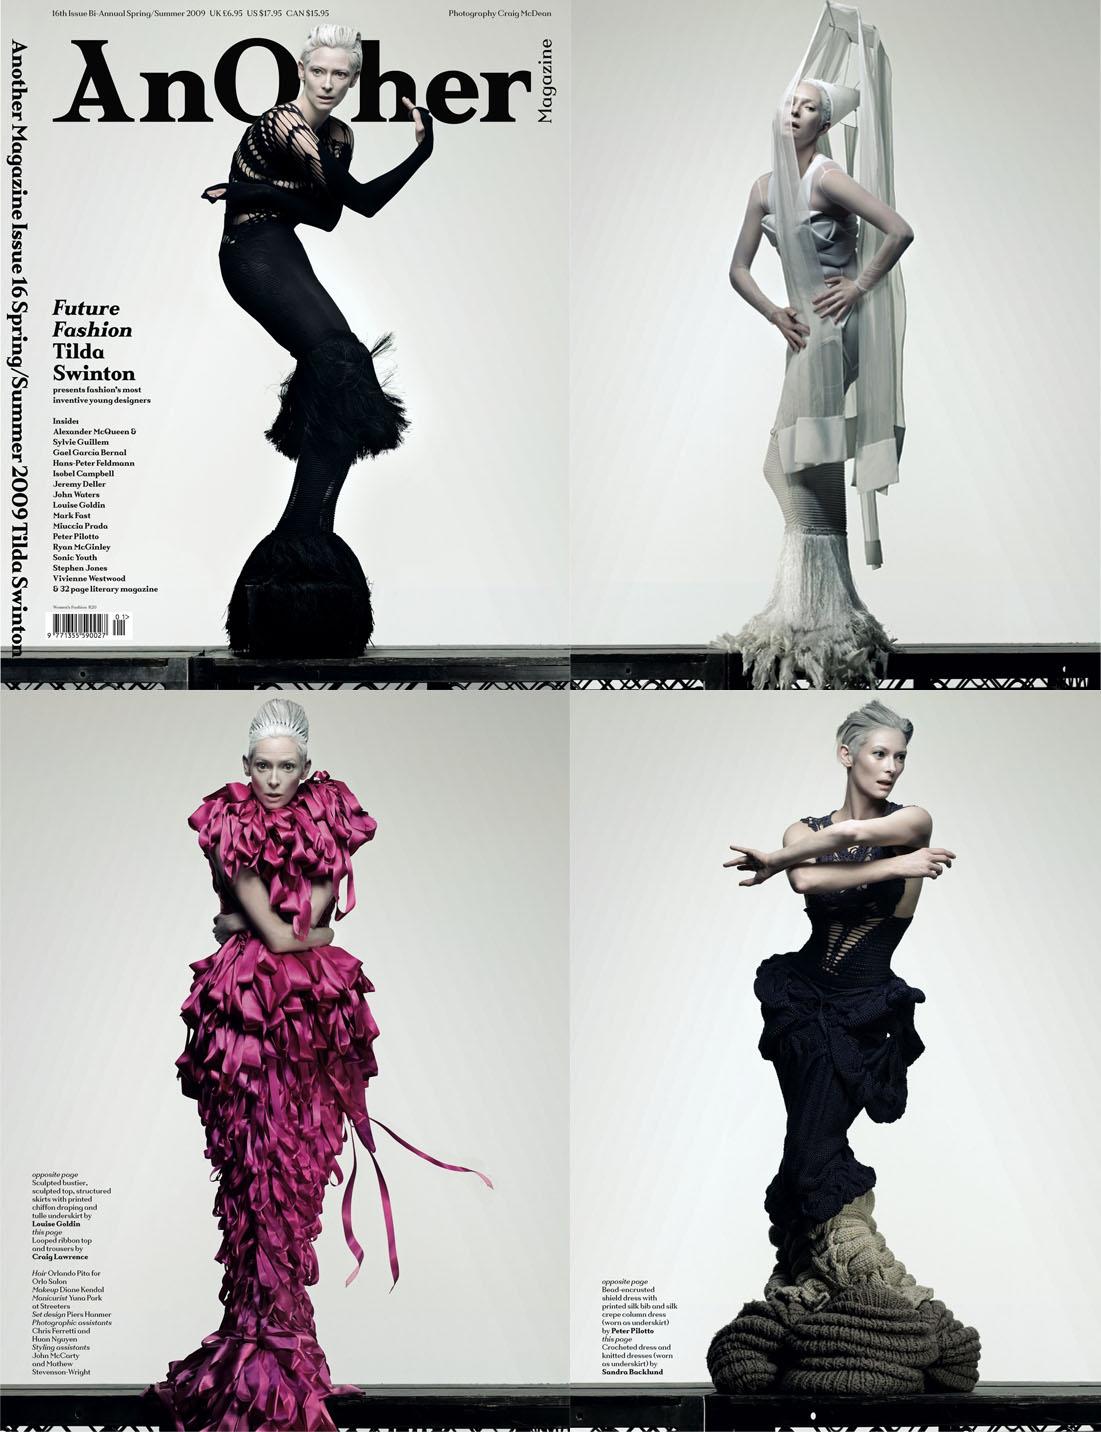 http://4.bp.blogspot.com/_twYmnhXVfP4/StKcRExbtZI/AAAAAAAAGxw/Mv5-ntTPXQs/s1600/fashionweek.jpg